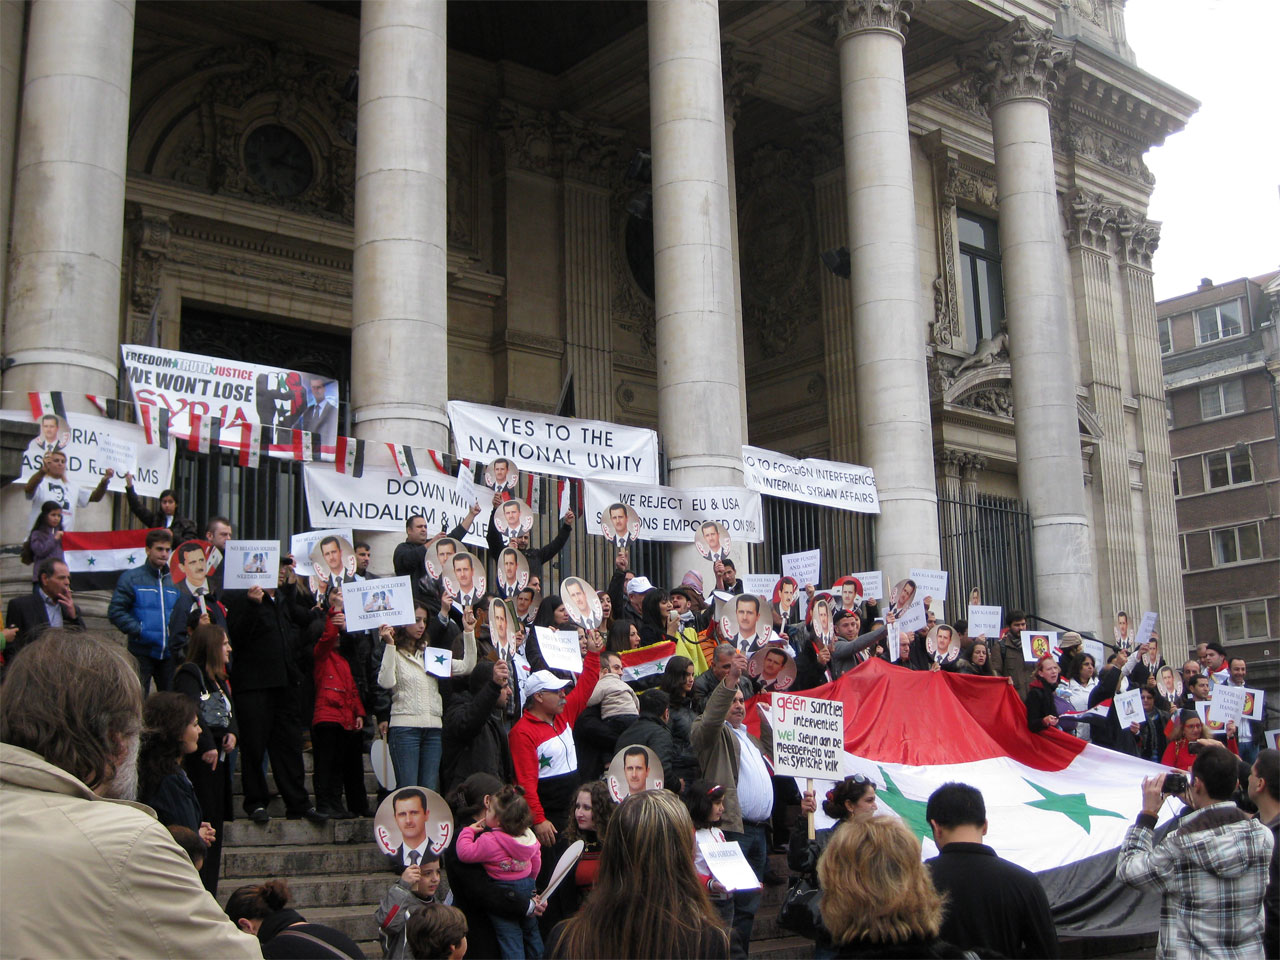 Pro-Assad demonstration, Brussels, Belgium